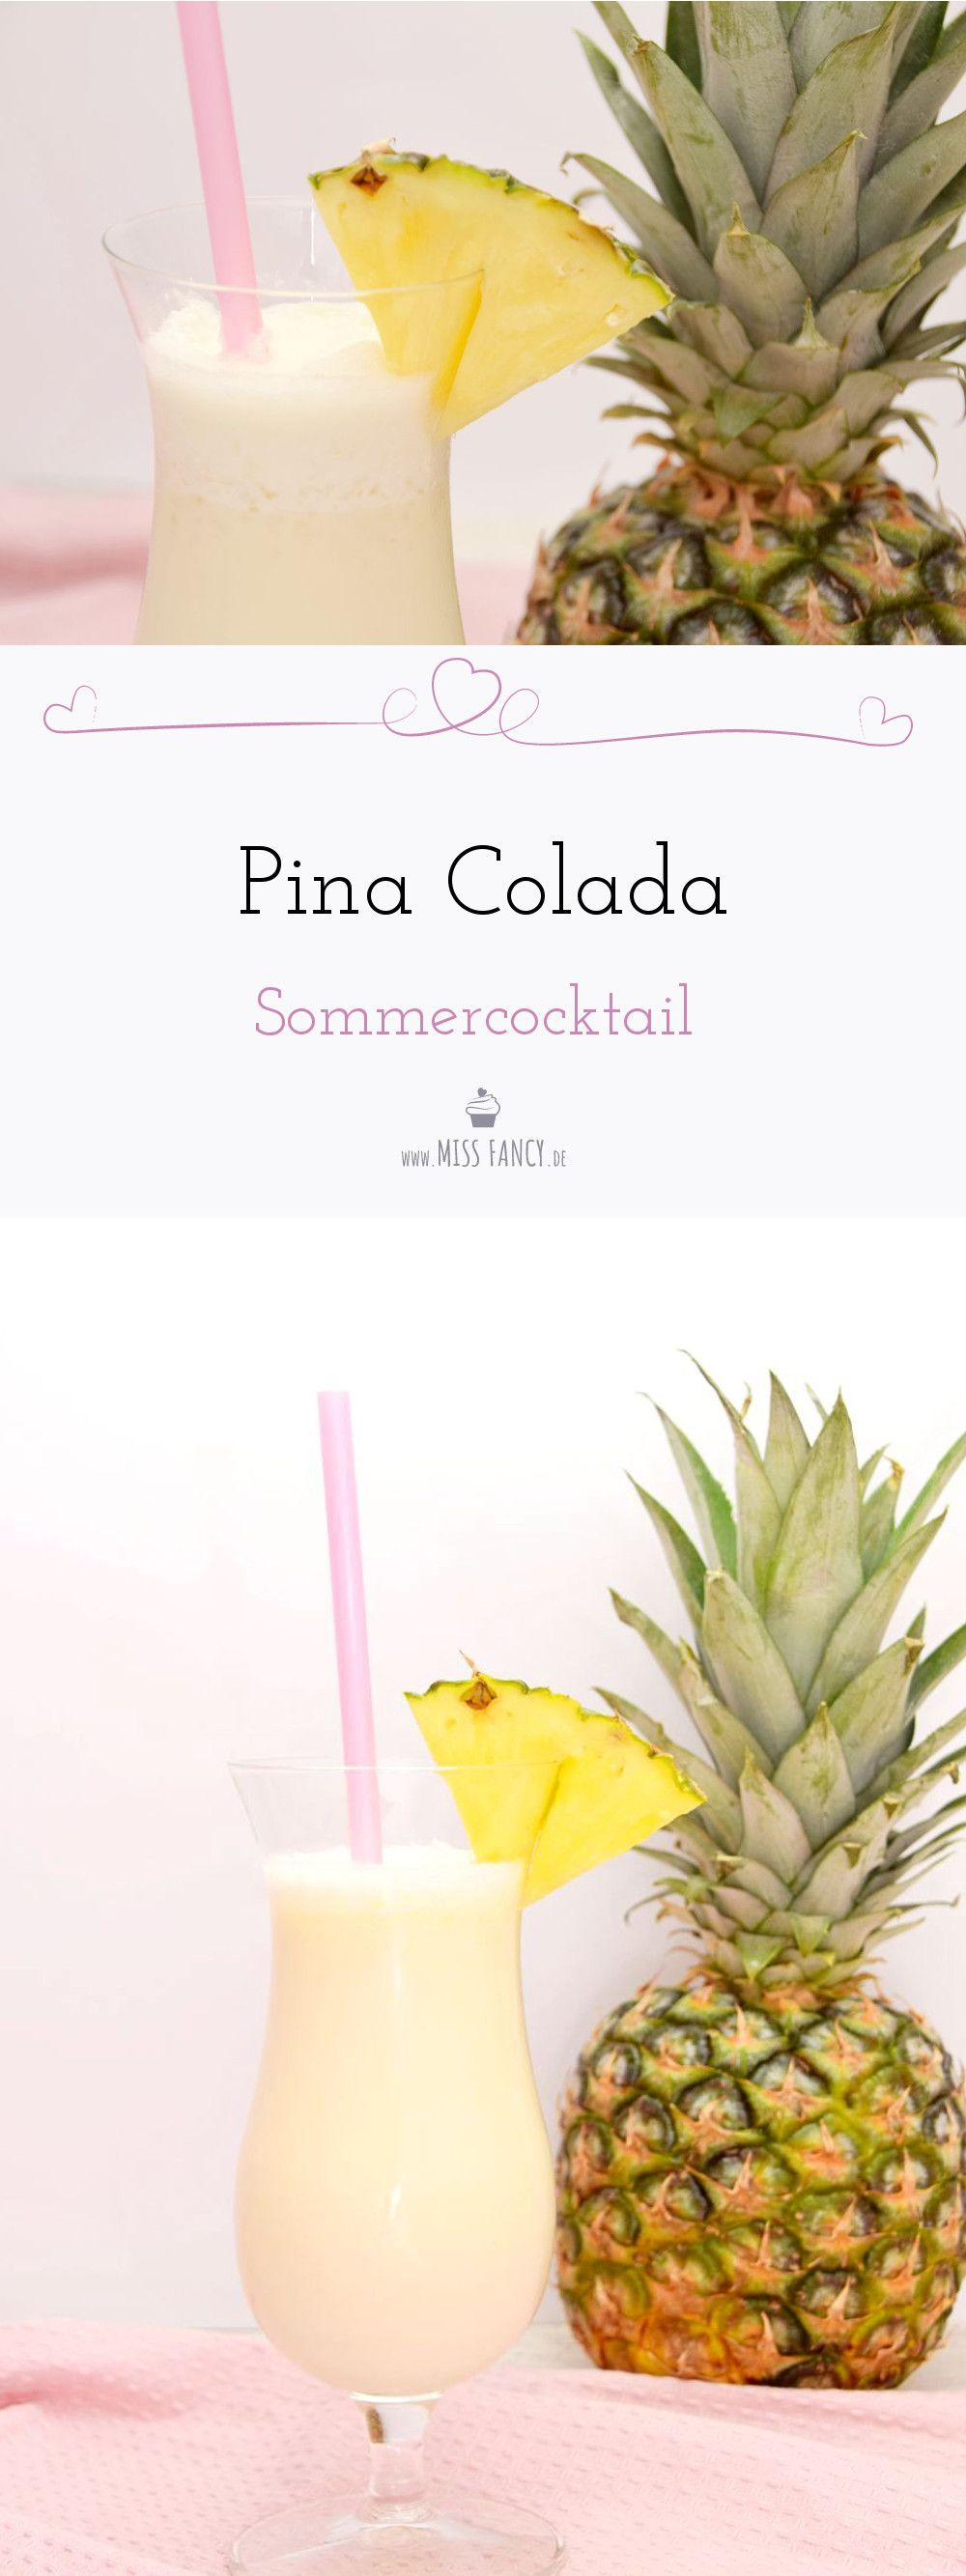 sommercocktail pina colada cocktails leckere cocktails. Black Bedroom Furniture Sets. Home Design Ideas